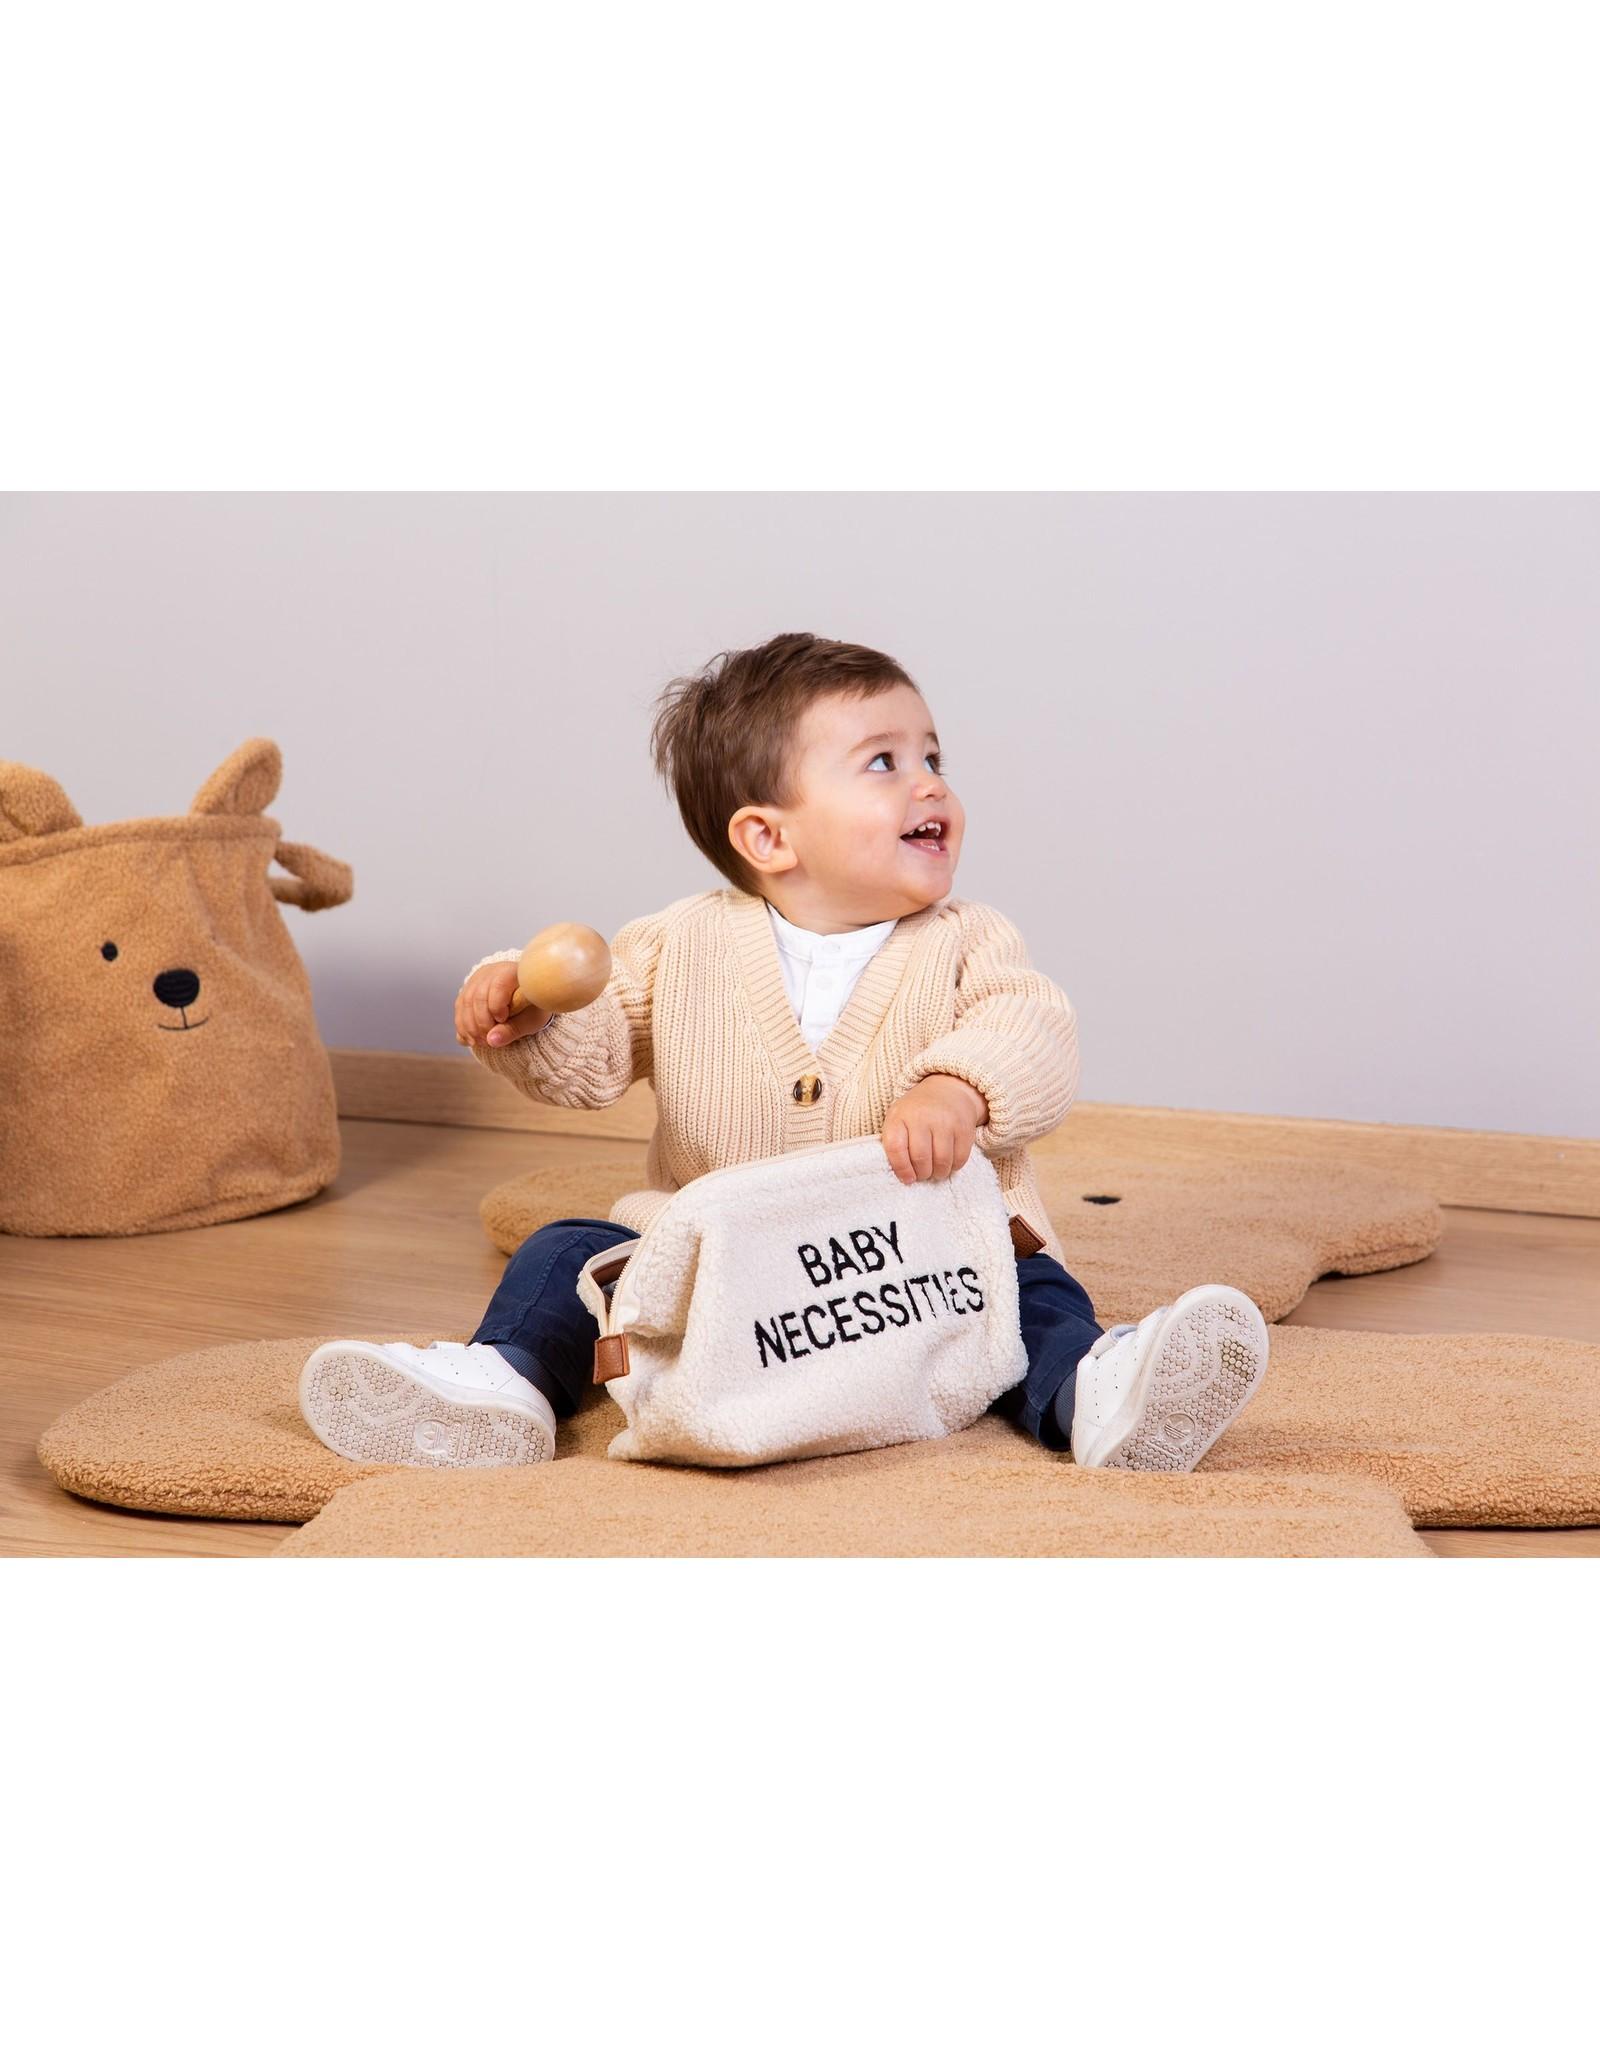 Childhome BB neccessities Teddy off white